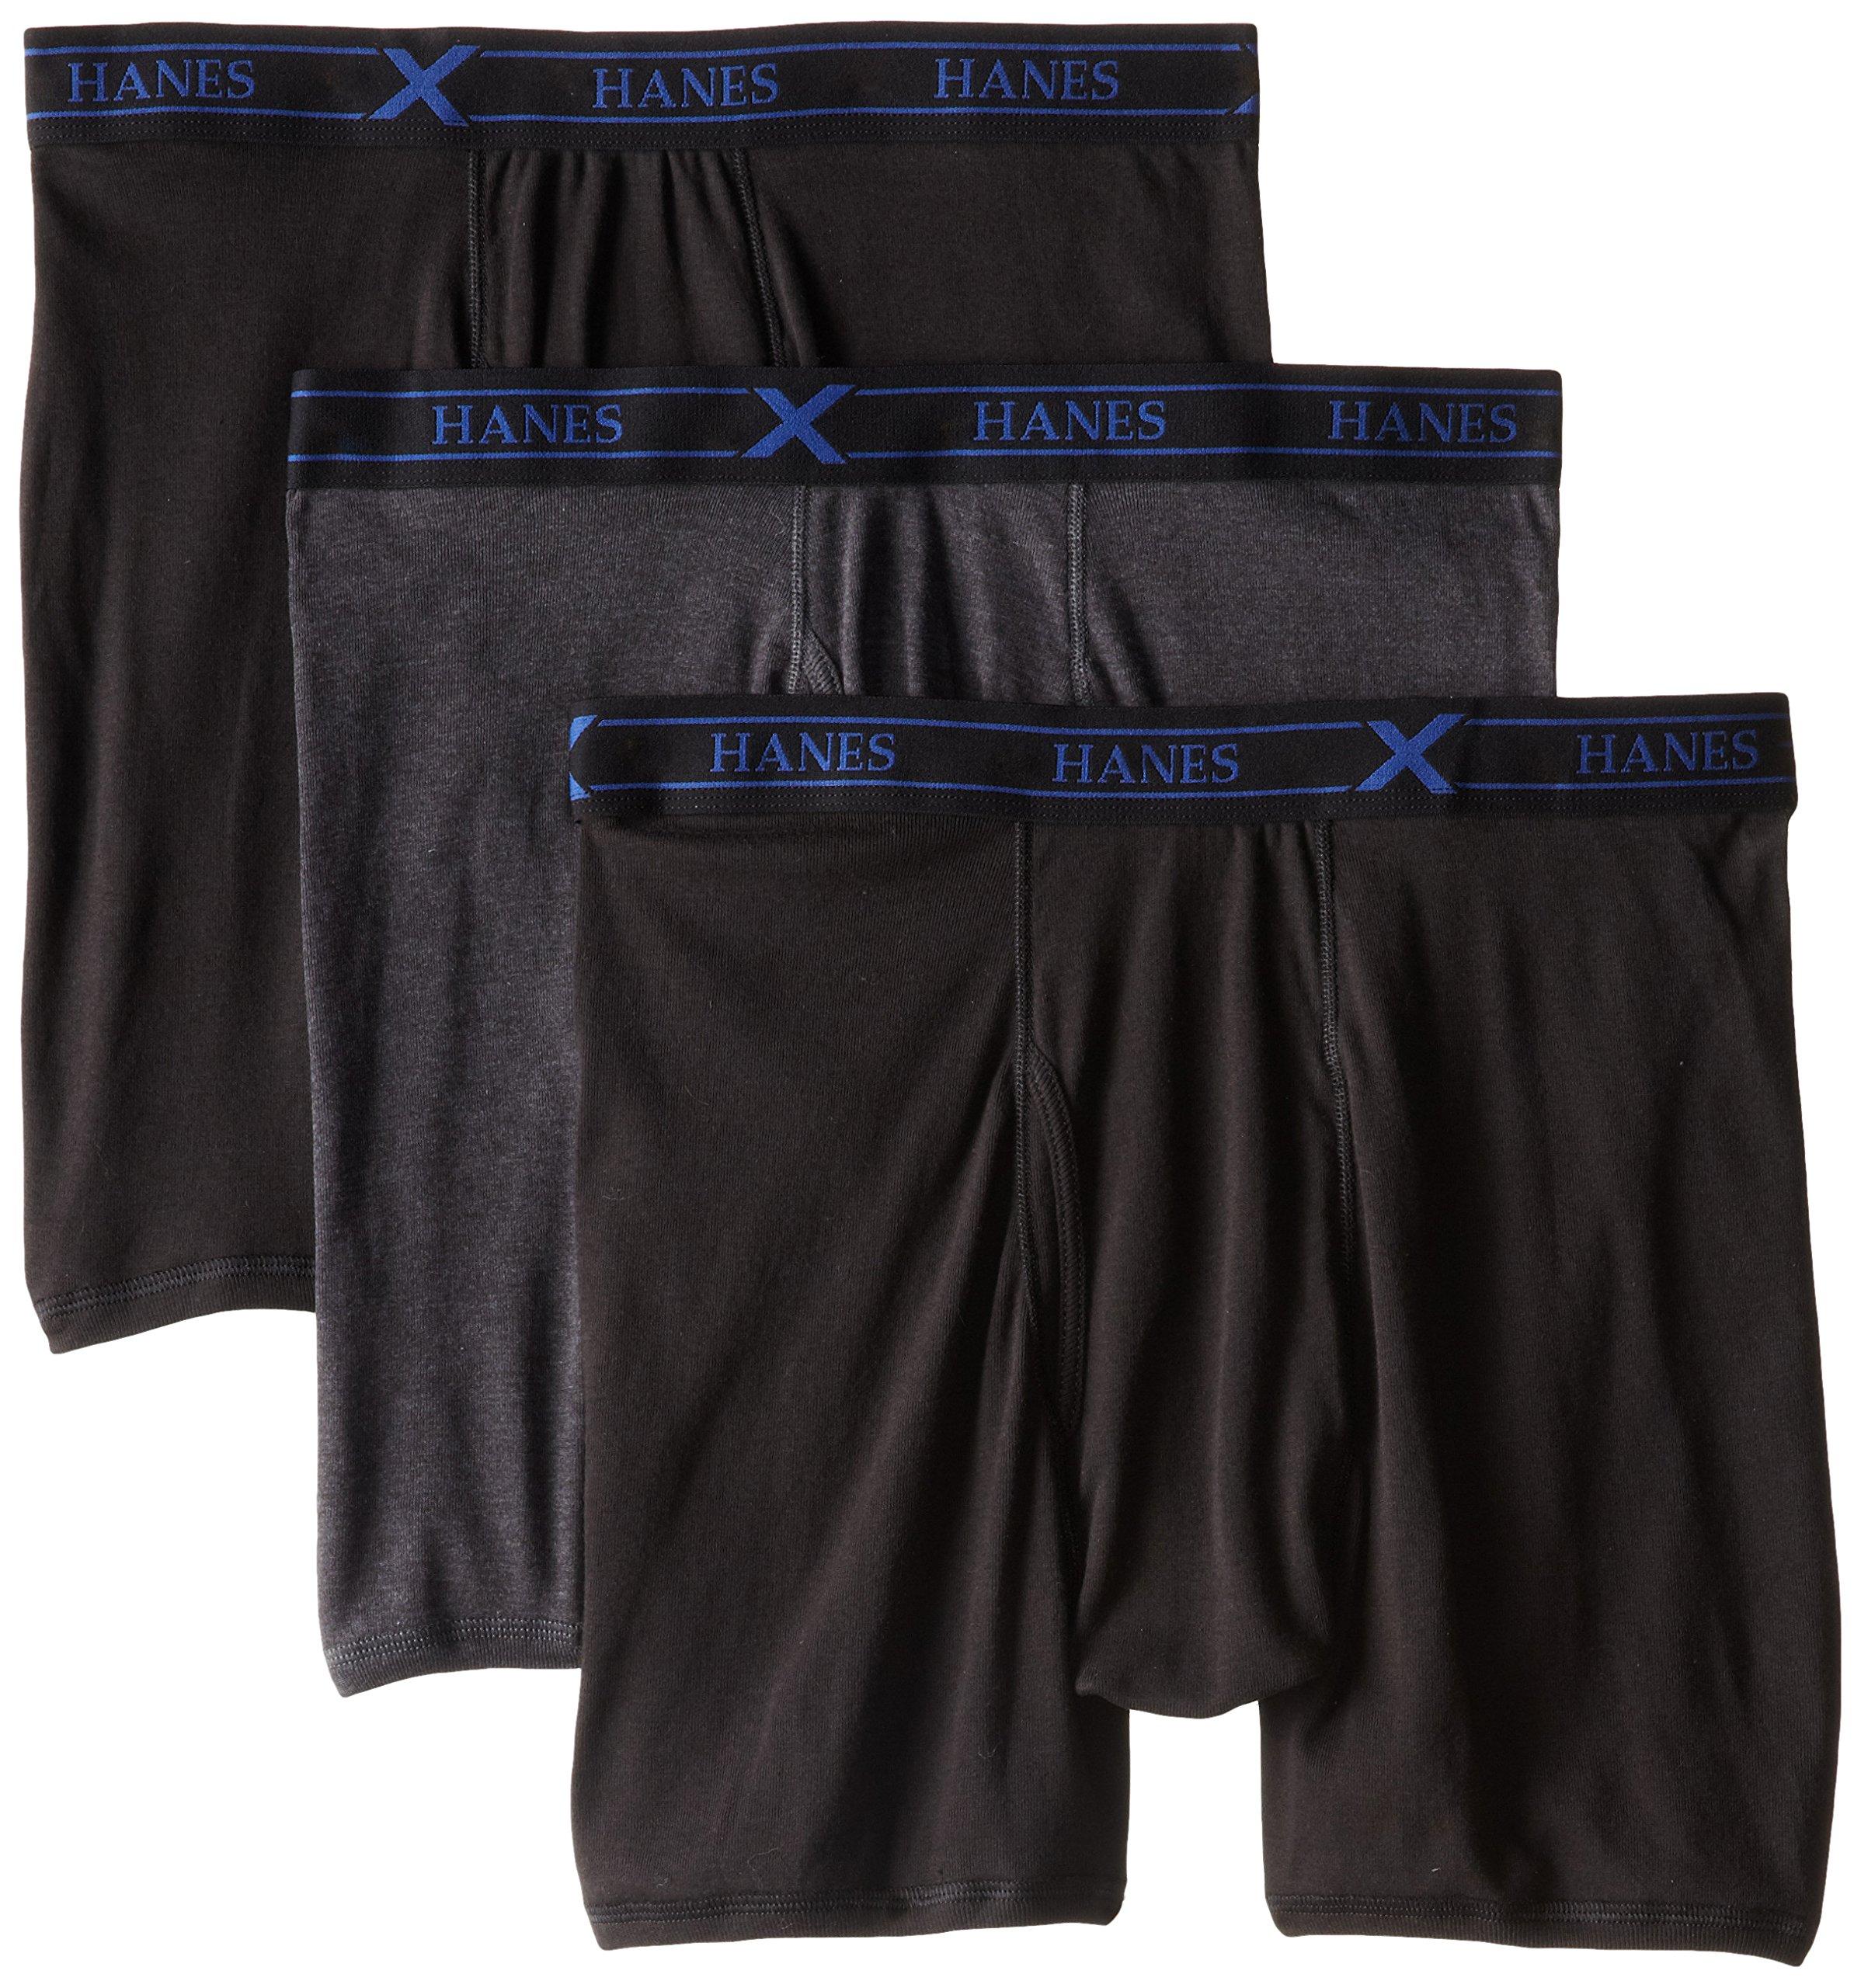 Hanes Ultimate Men's 3-Pack X-Temp Boxer, Black/Heather Grey, XX-Large